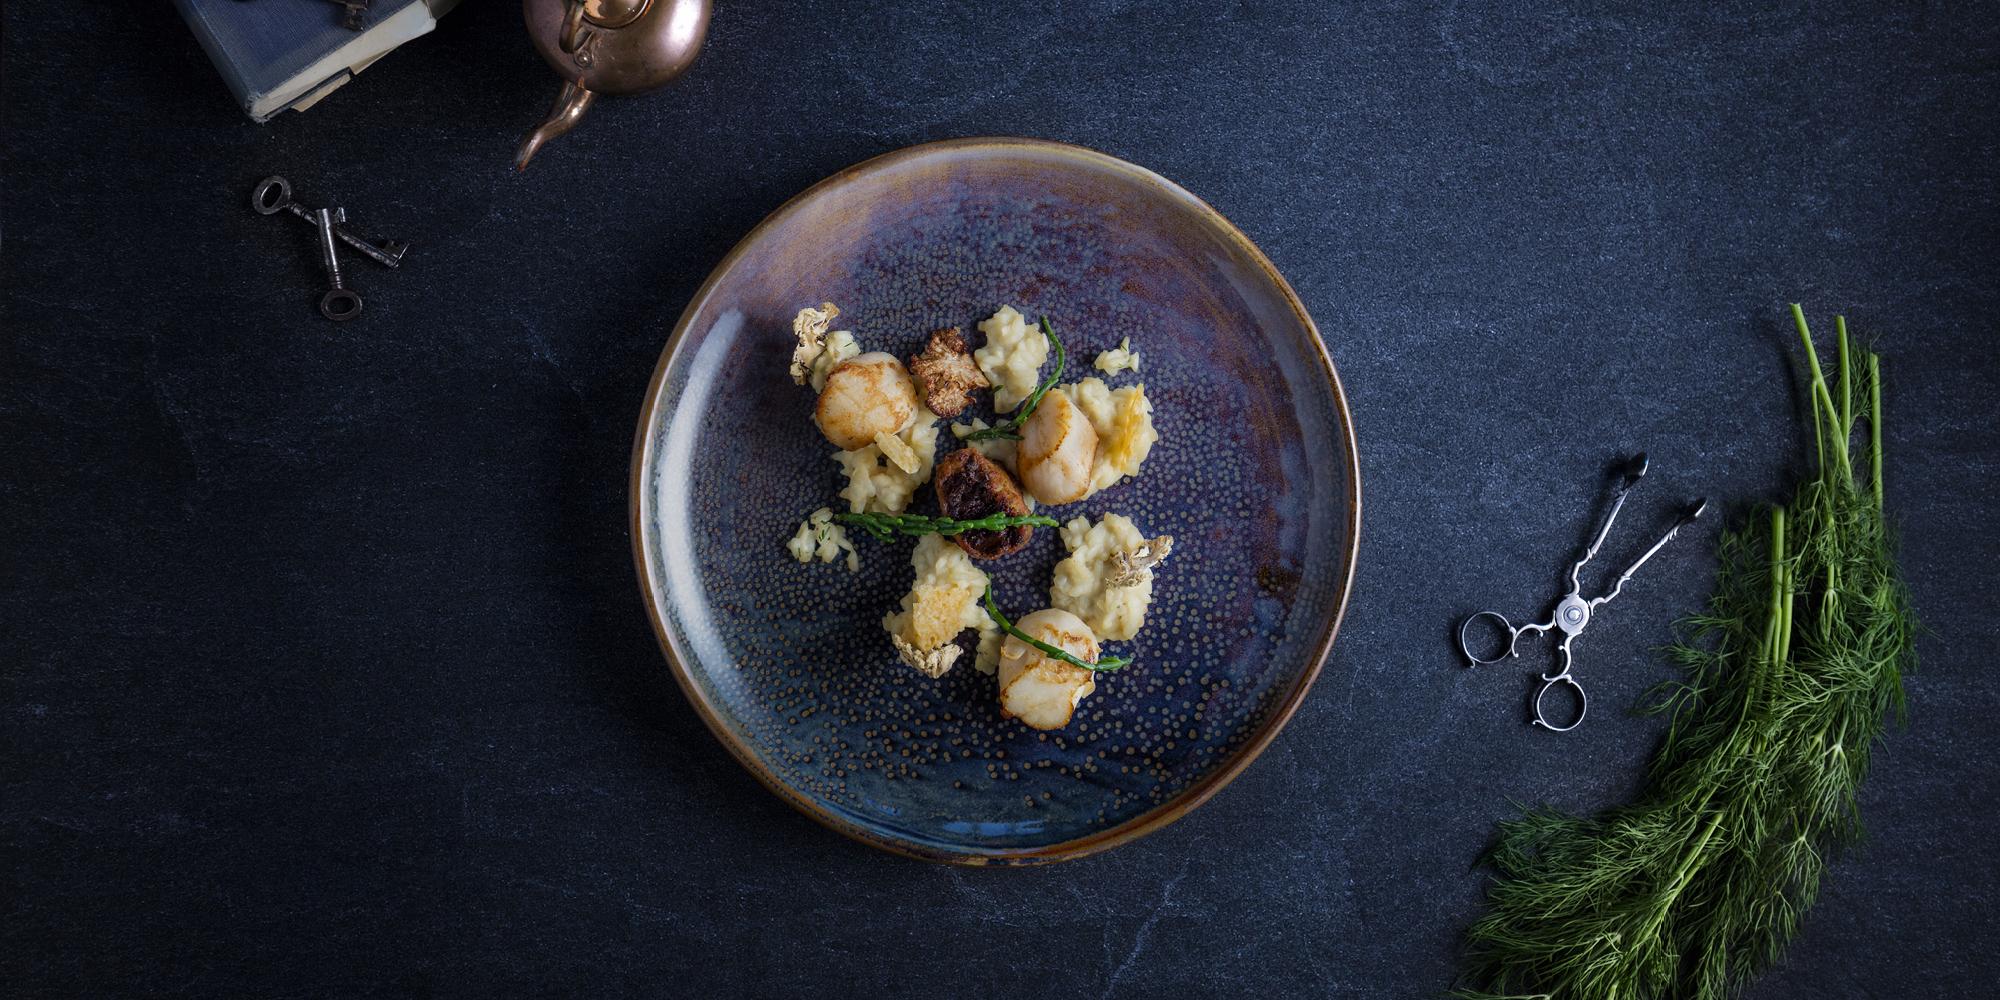 The Grahamston I Scottish Scallops served with cauliflower cheese risotto, crisp pigs cheek and samphire